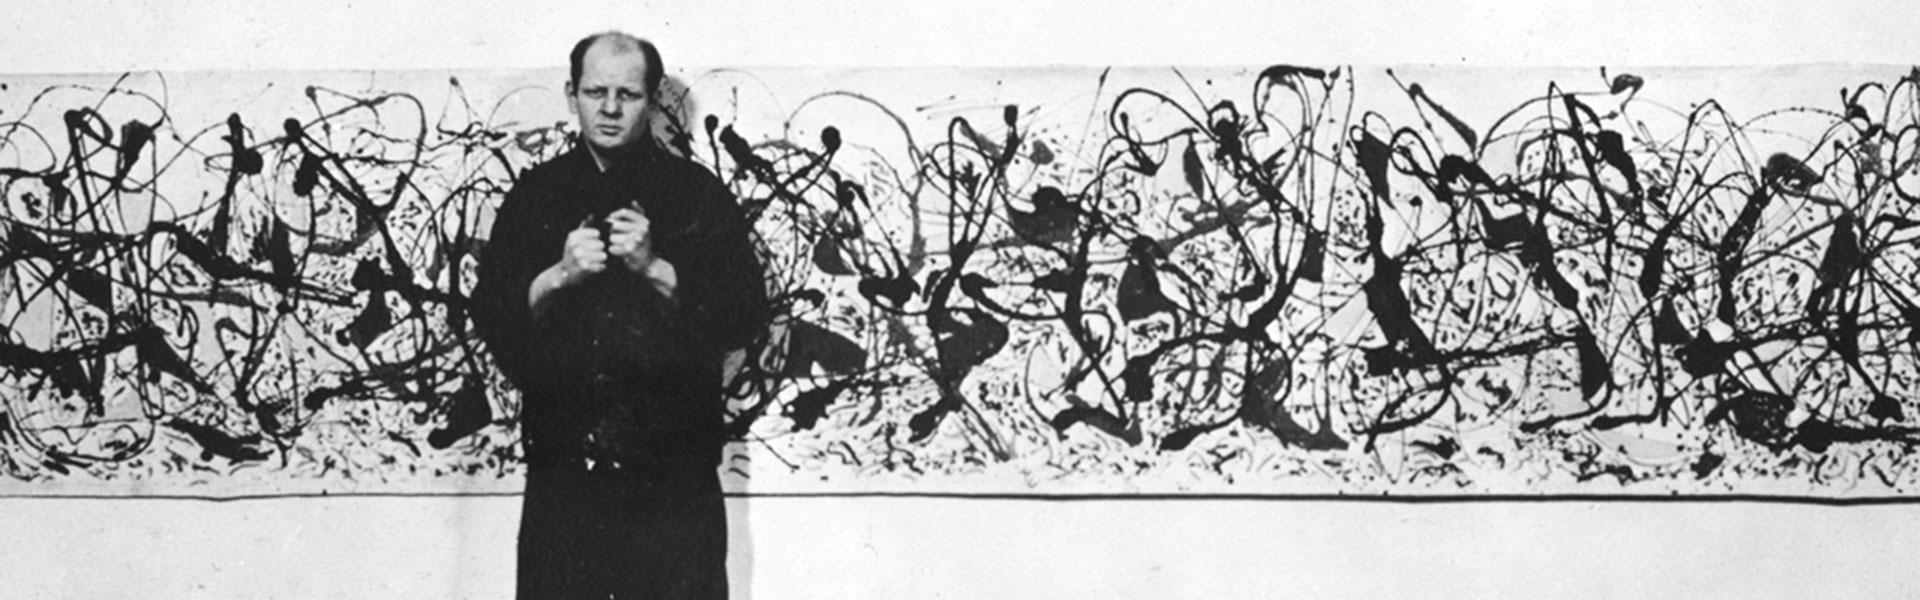 pollock_banner.jpg.webrend.1920.350